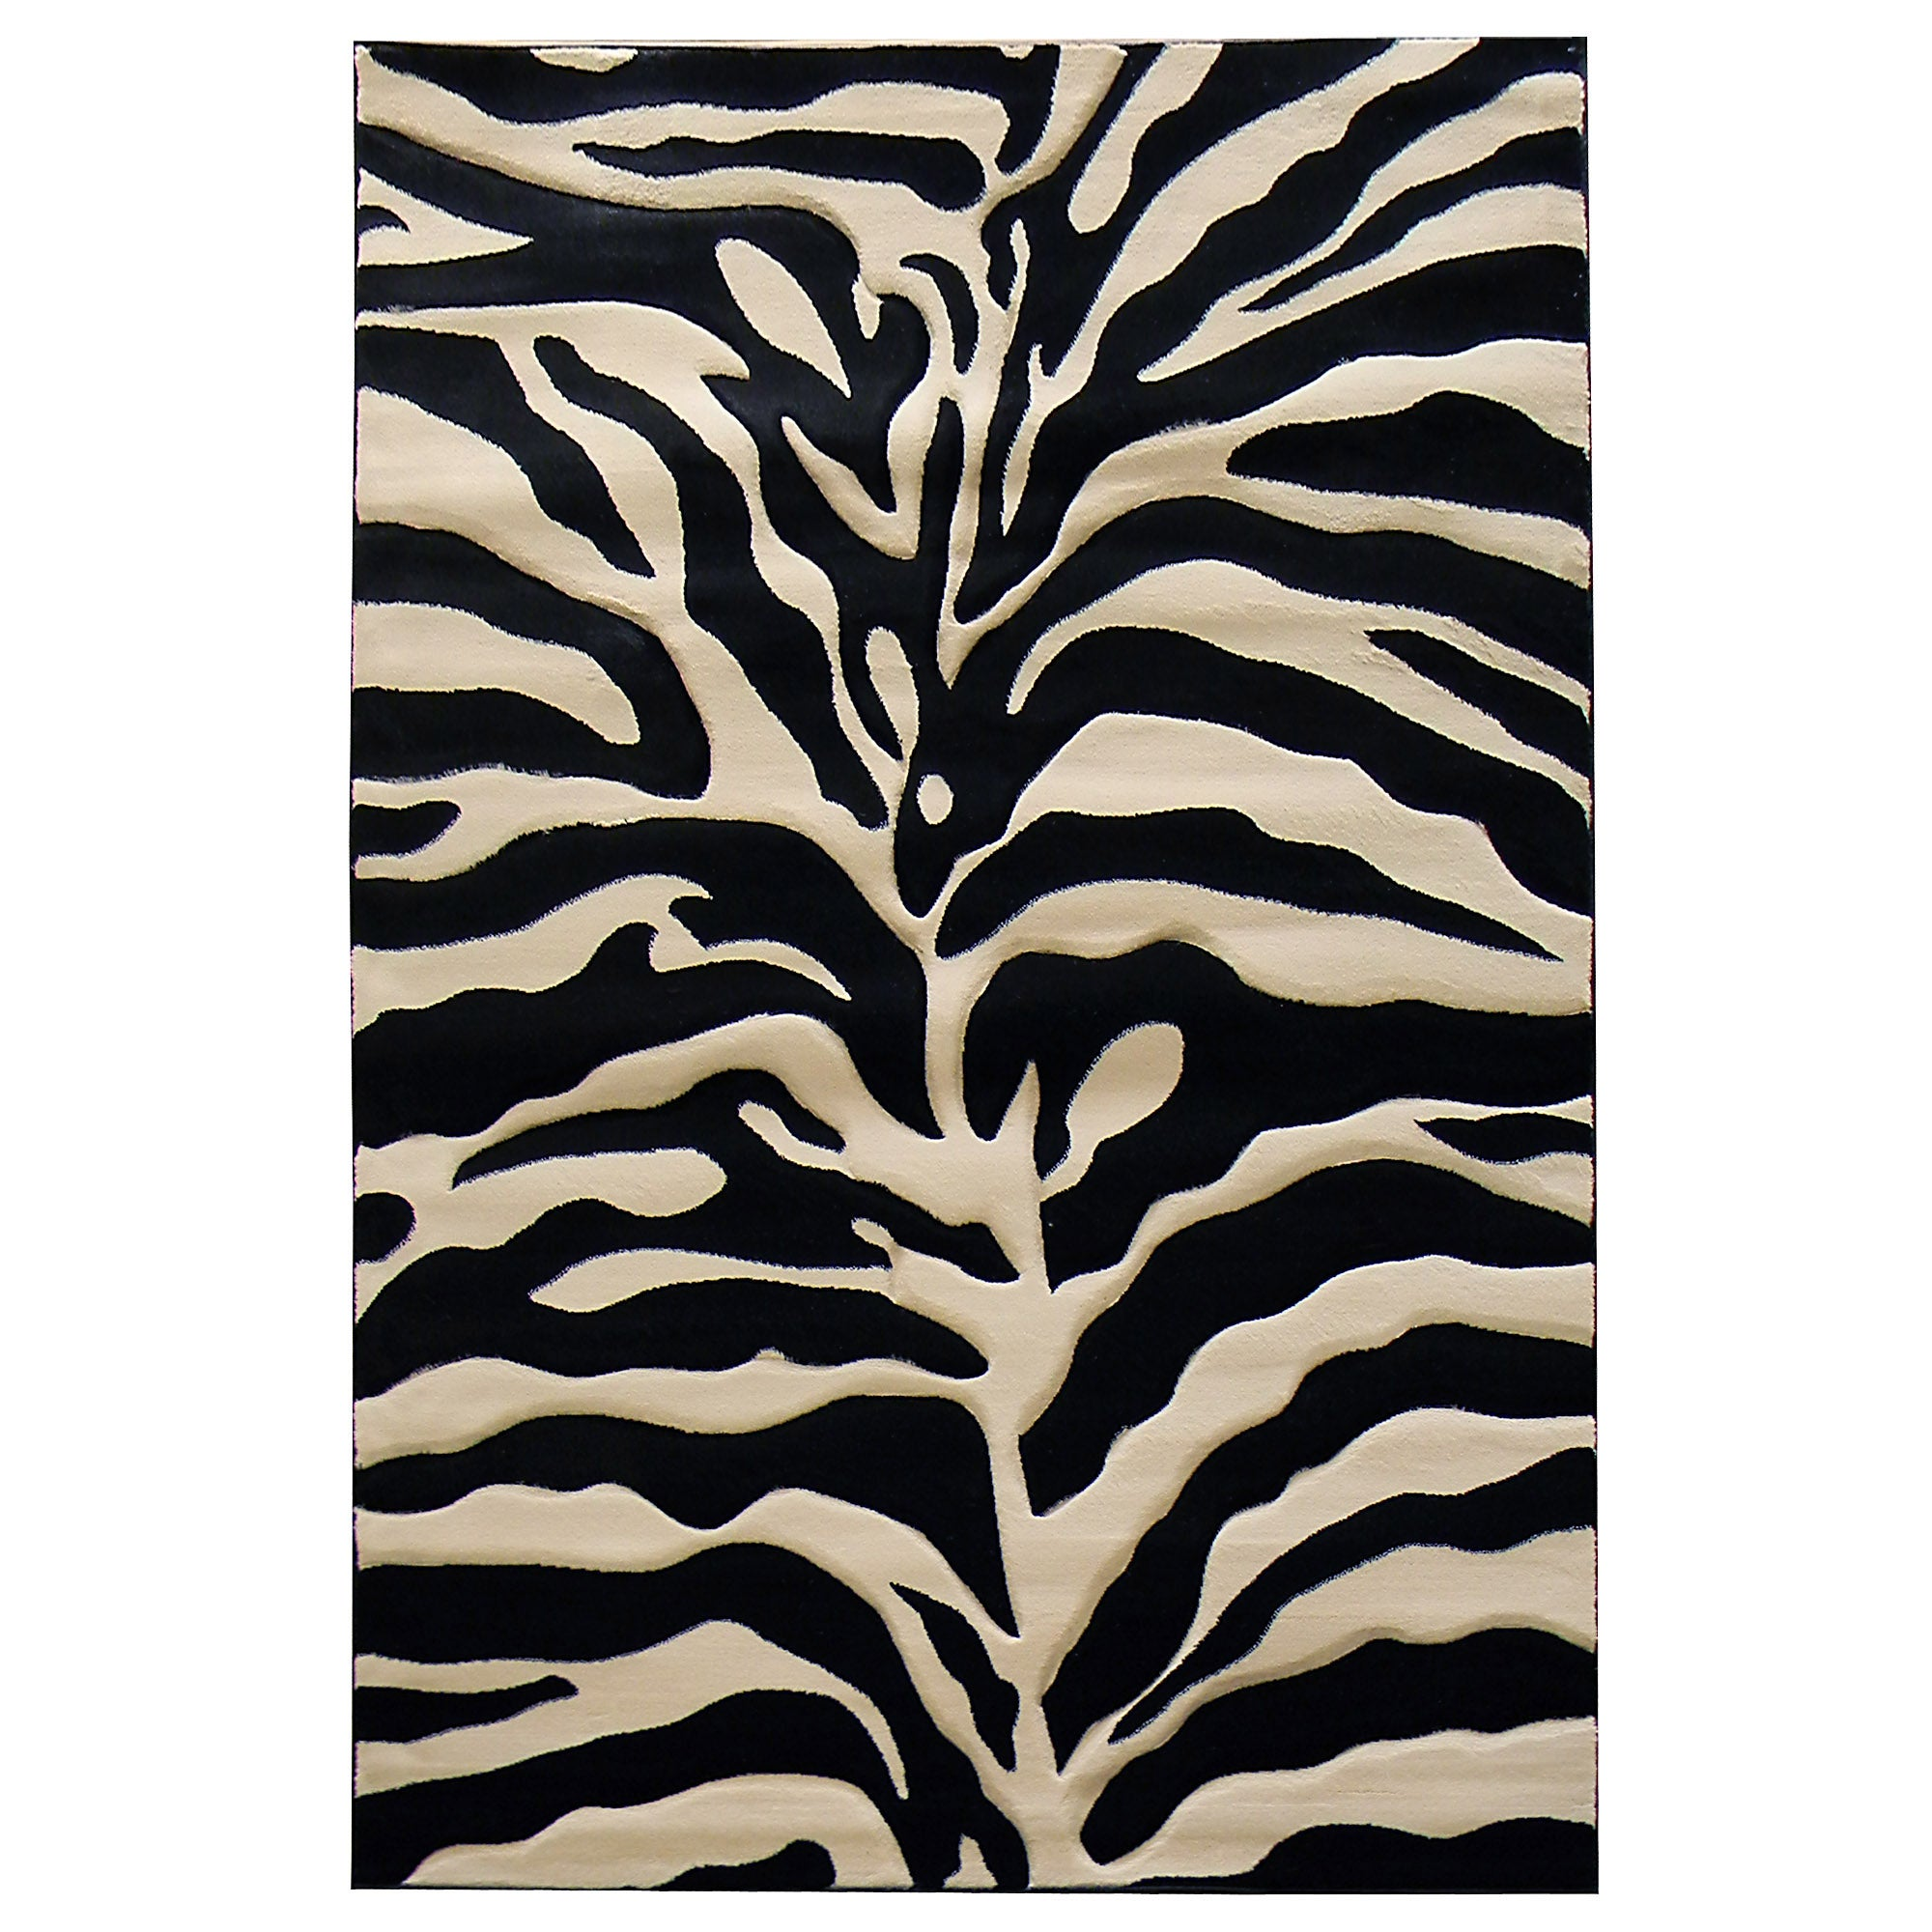 DonnieAnn Zebra Print Black/ Beige Area Rug (5' x 7') (Bl...